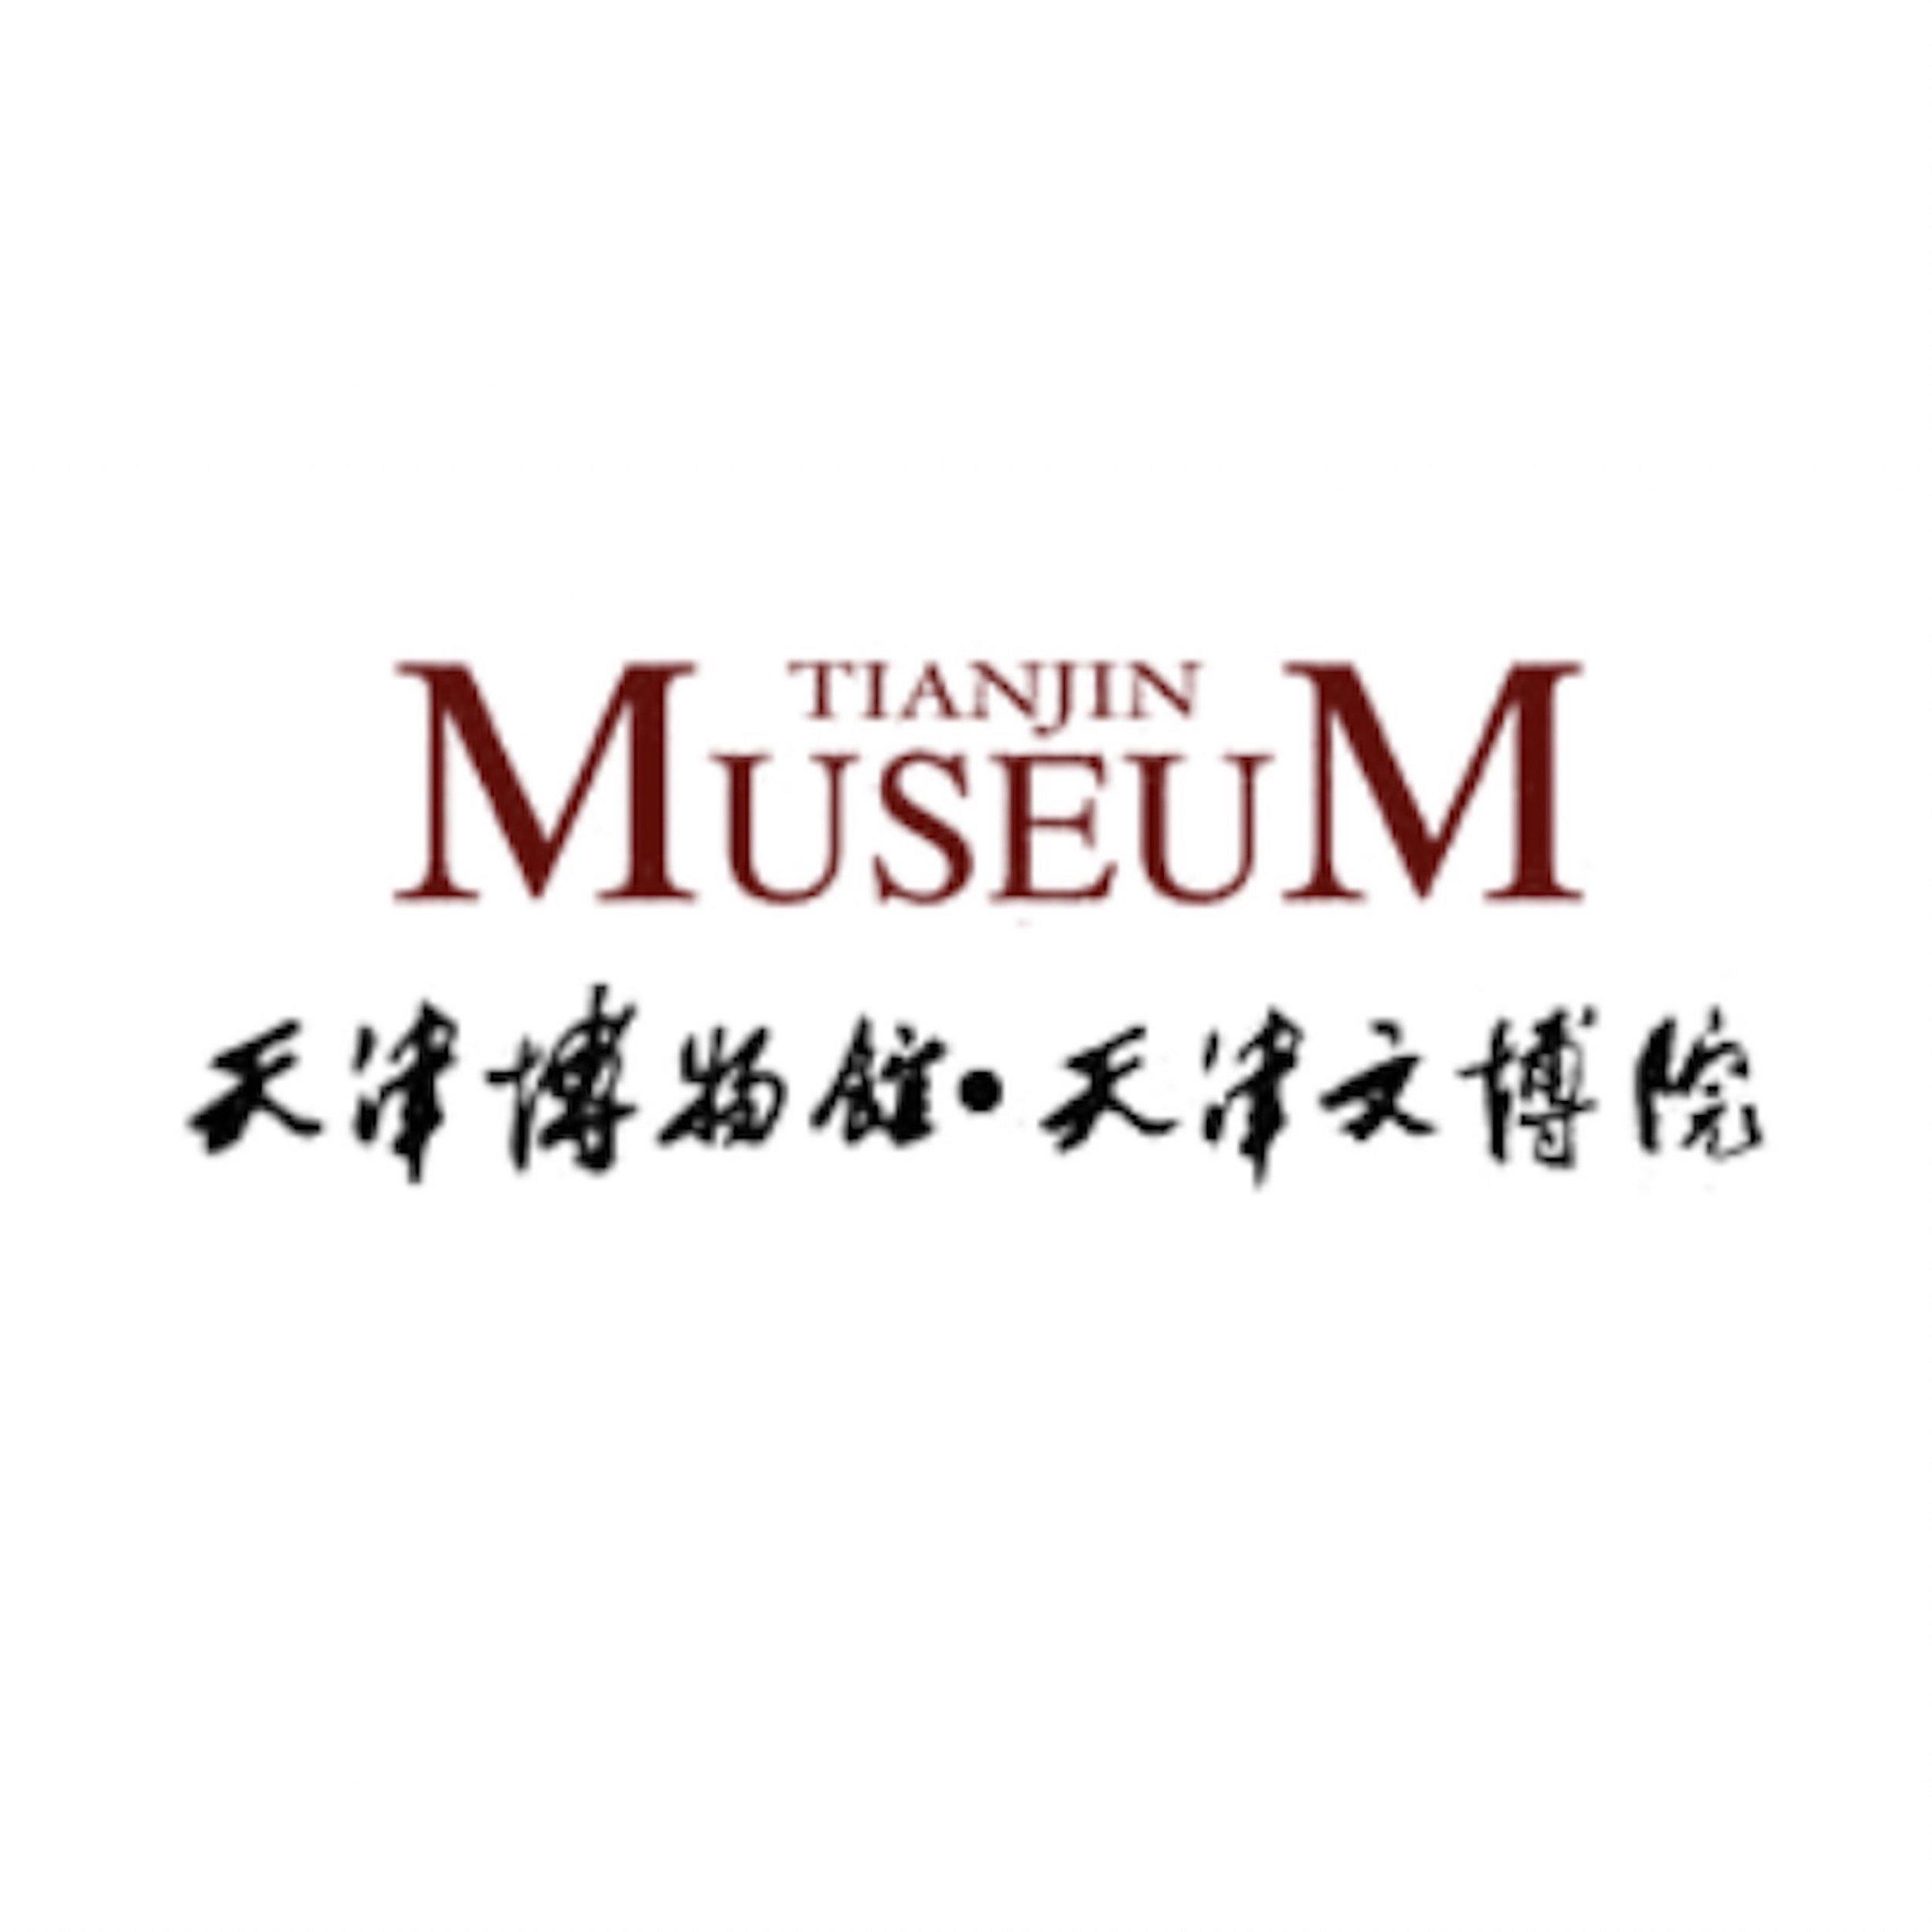 Tianjin Museum Square Logo copy.jpg